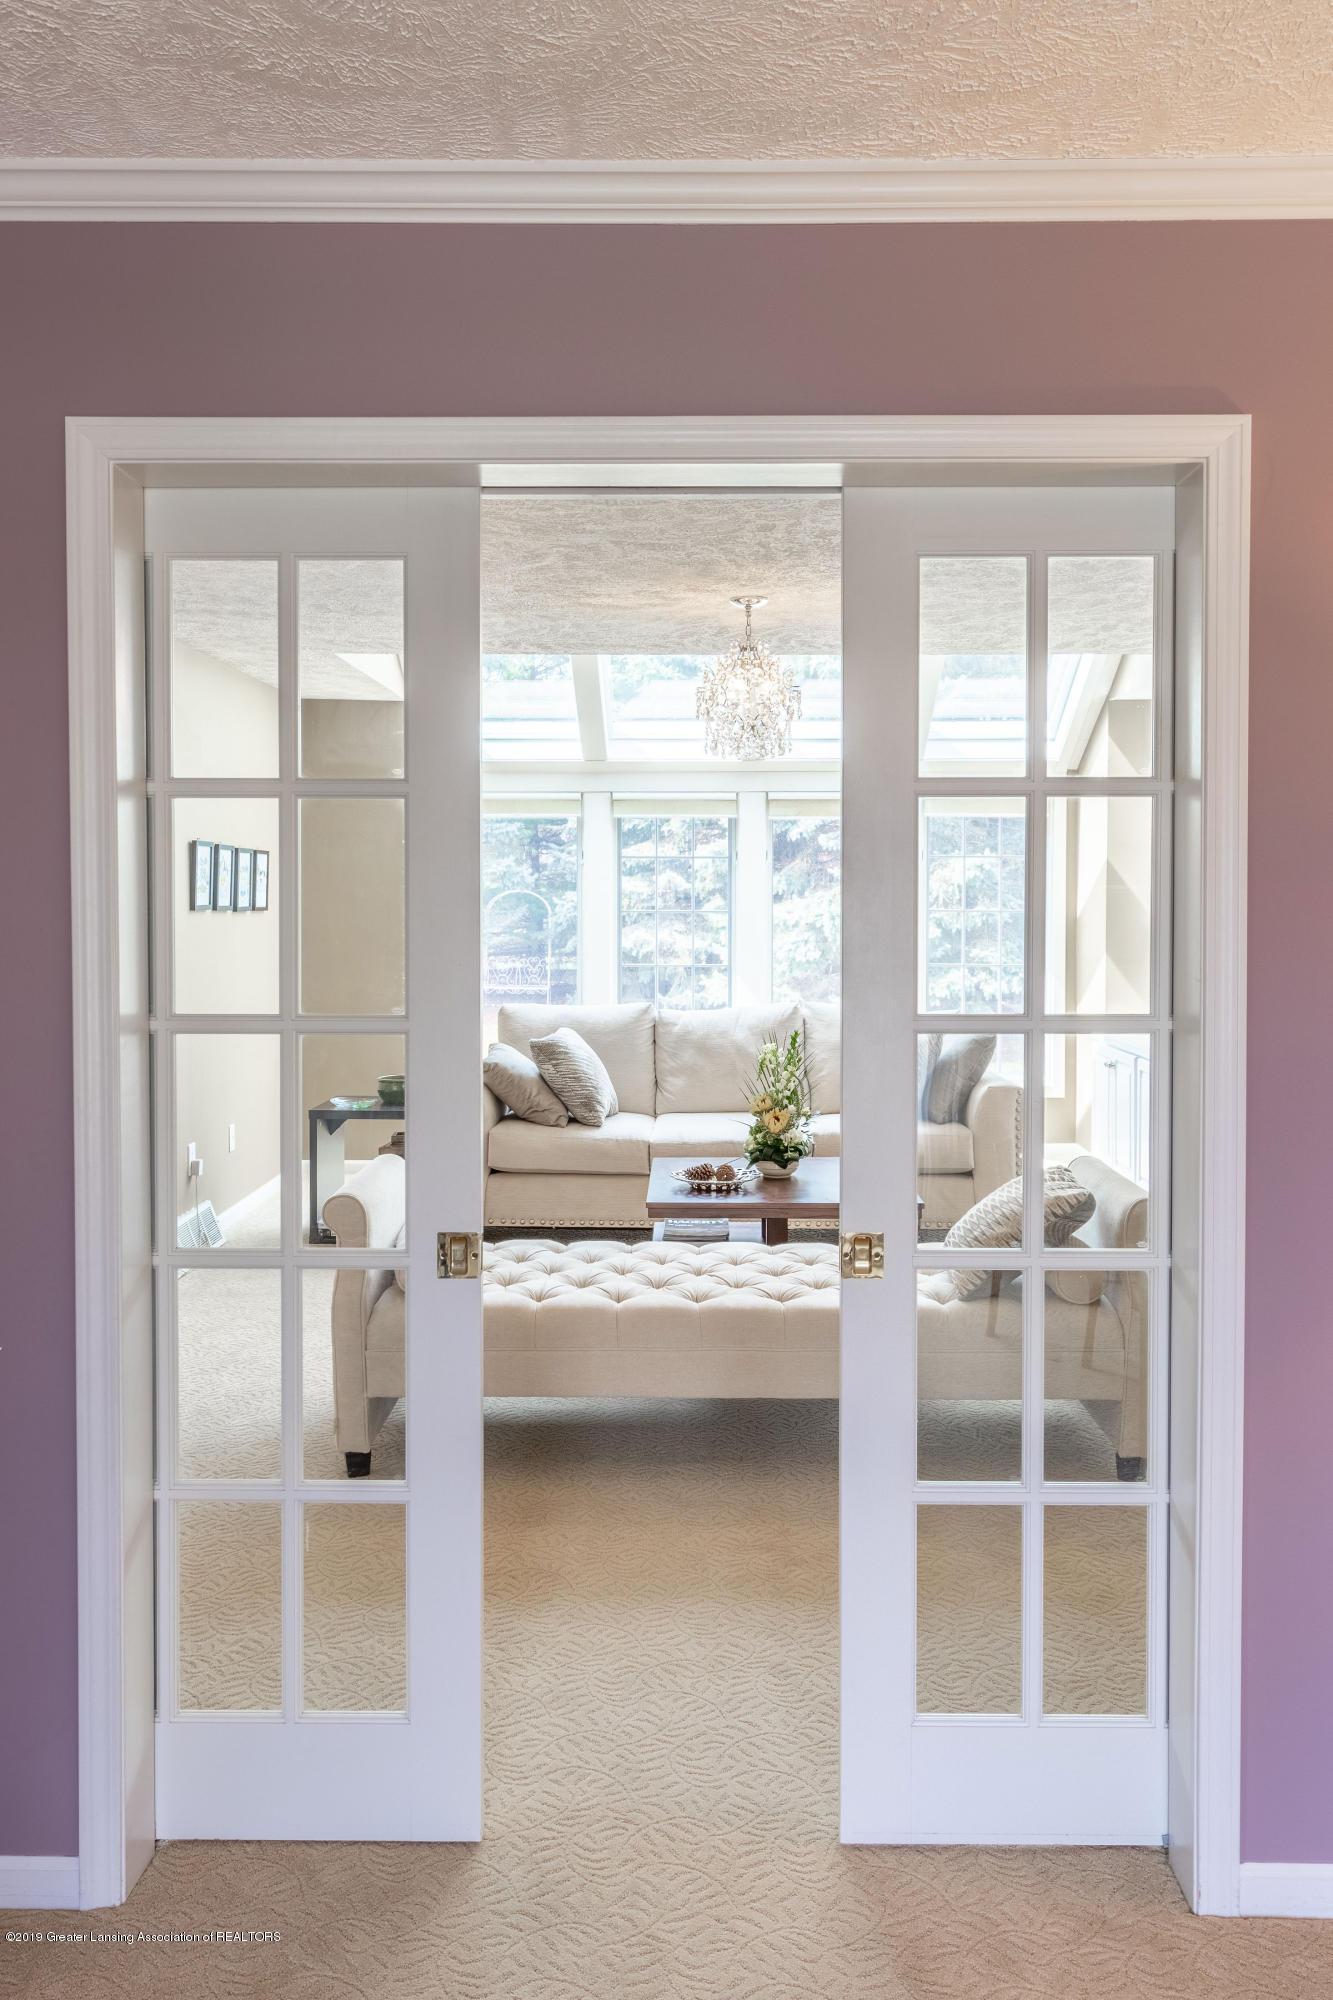 3065 Summergate Ln - Living Room - 10